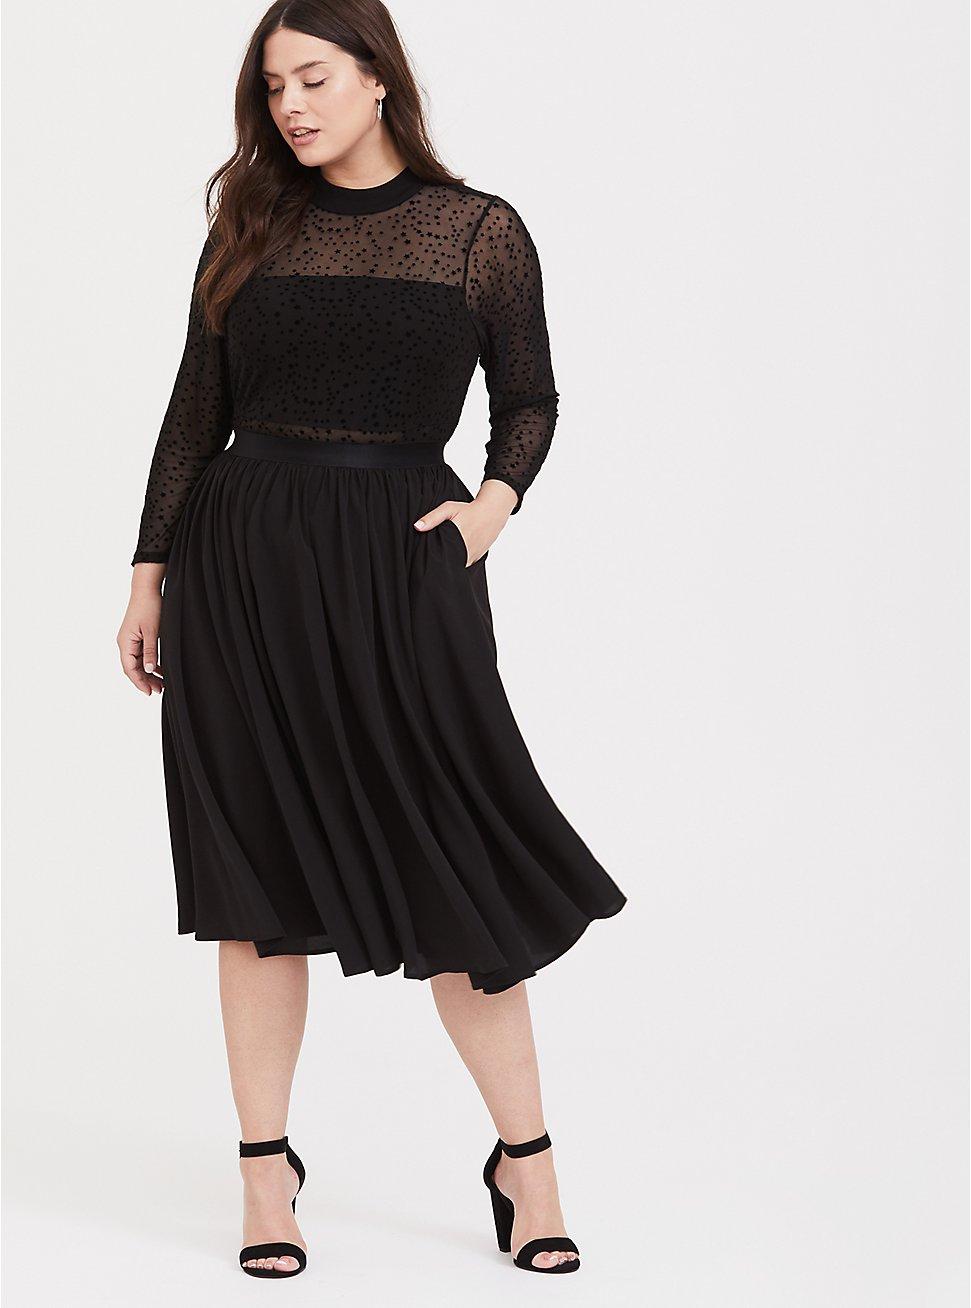 Black Mesh Flocked Star Mock Neck Midi Dress